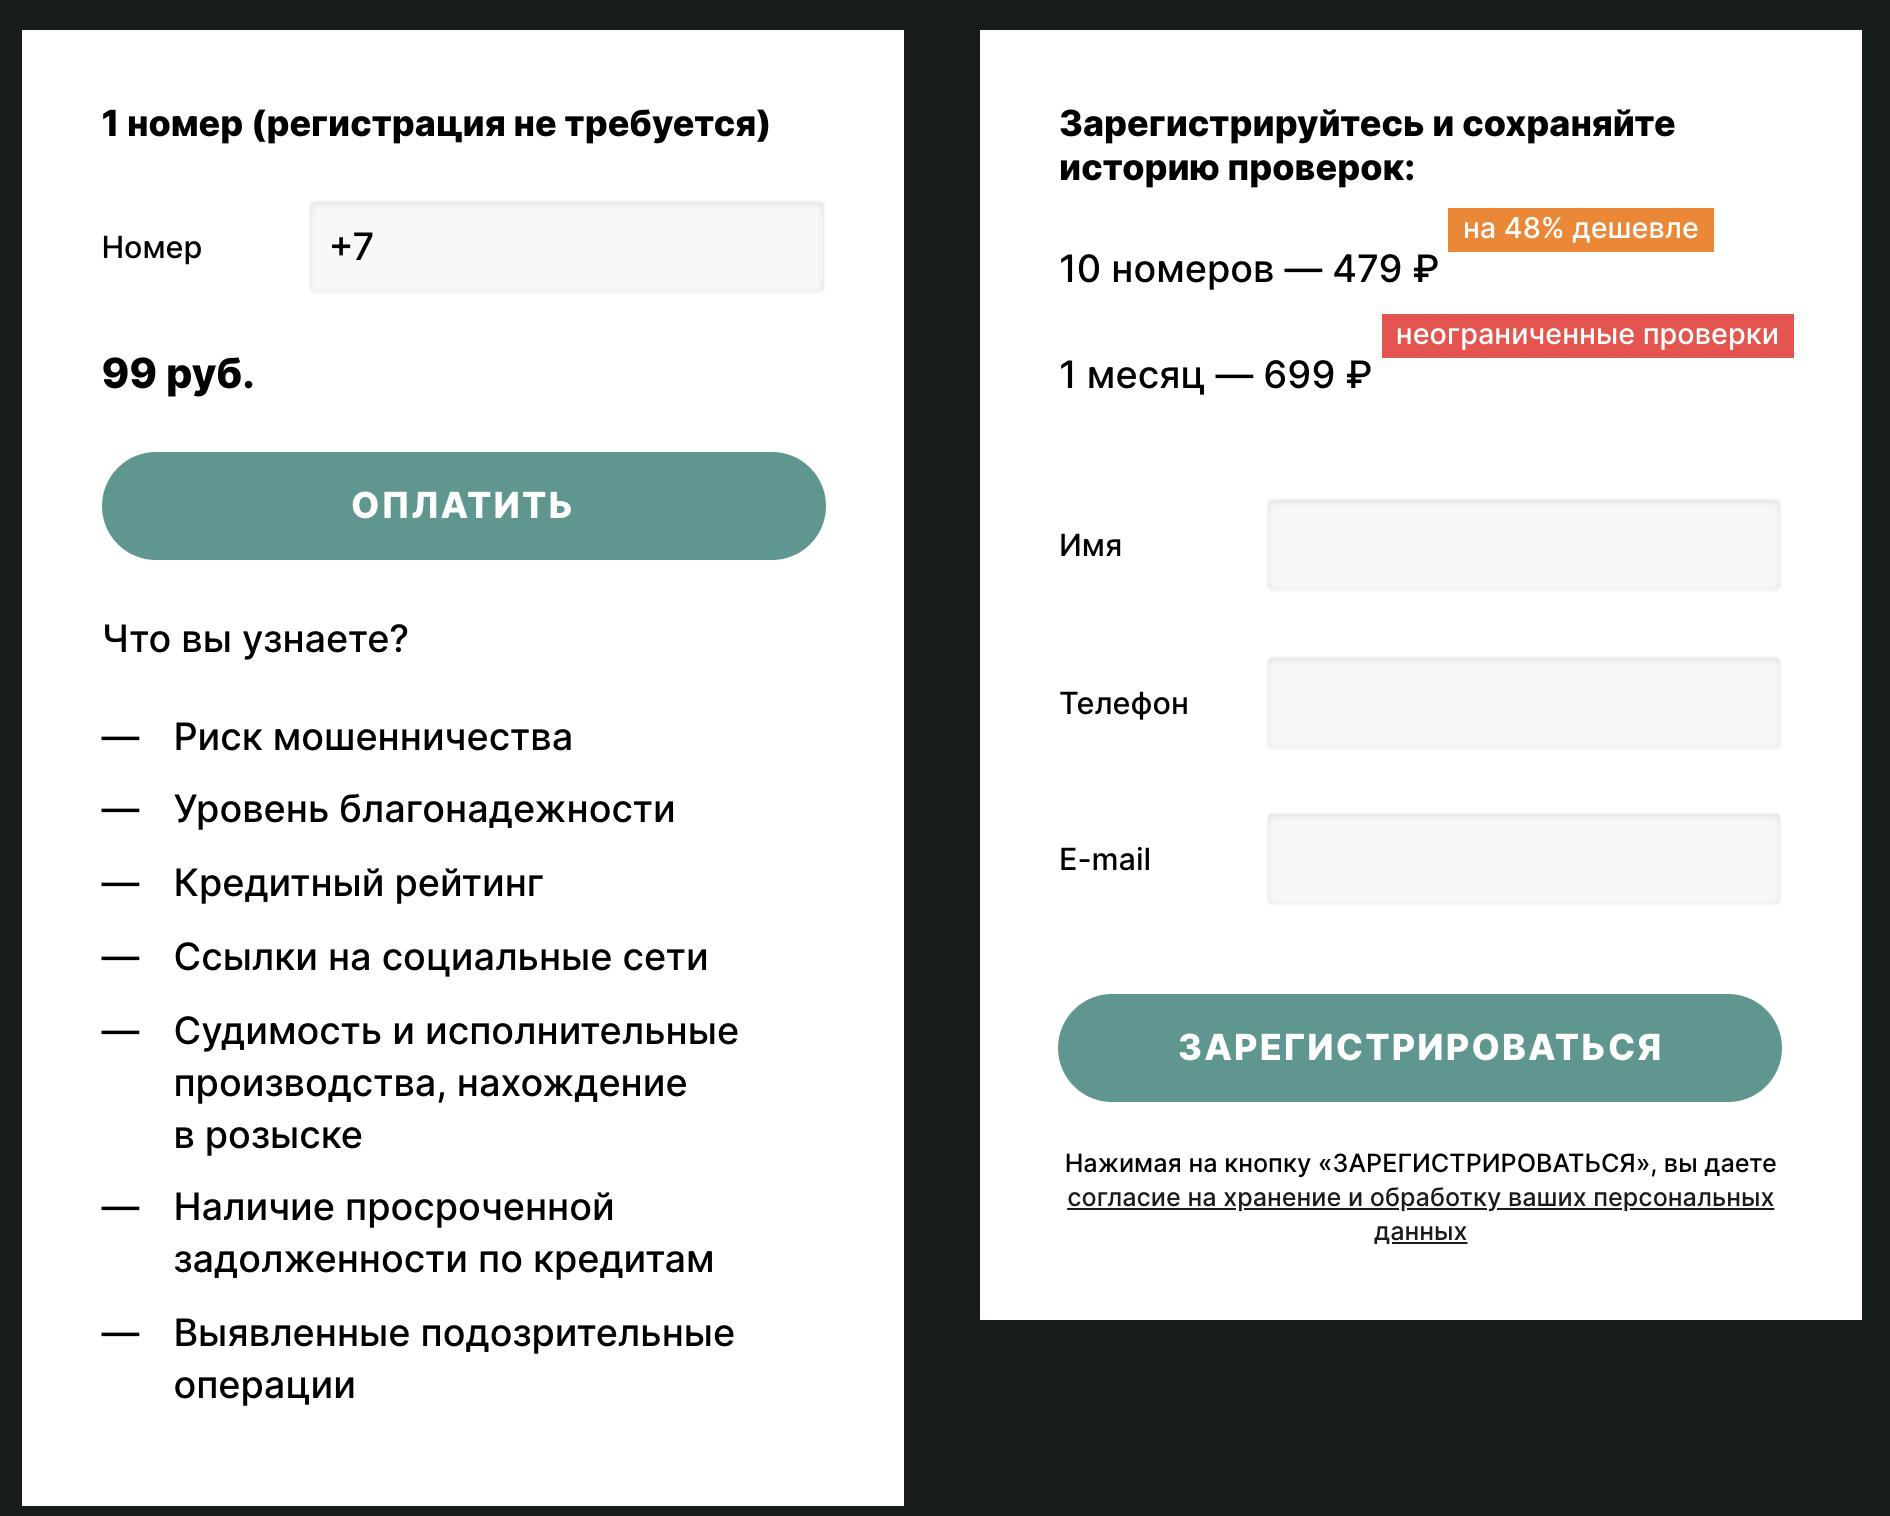 «Билайн» спрятал сайт для «пробива по согласию»: это не настоящий сервис, а имитация для анализа спроса - 1